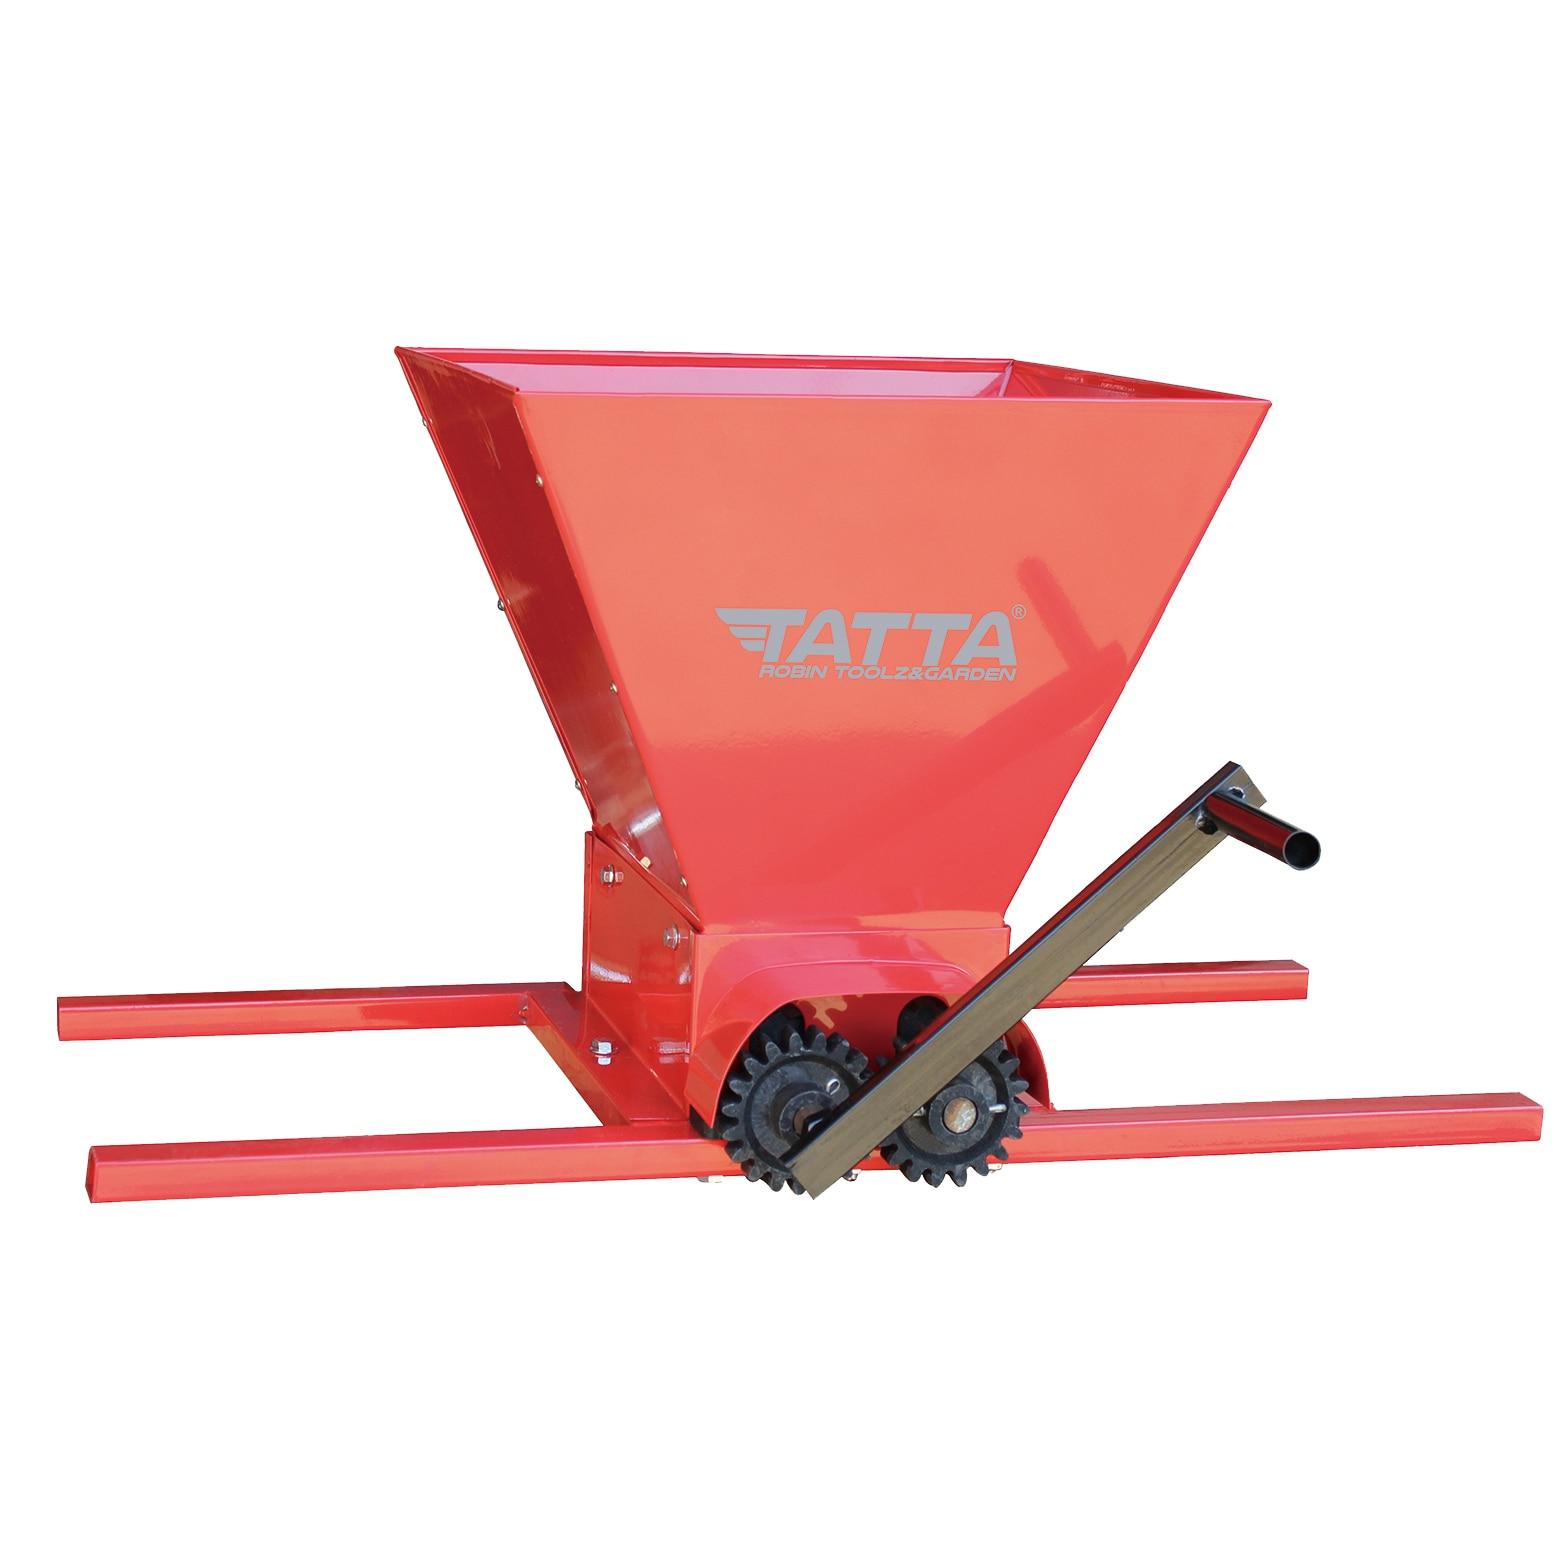 Fotografie Zdrobitor de struguri Tatta TZ-1802 RS, capacitate maruntire 300 kg/h, cuva 25 l, Fier, Rosu